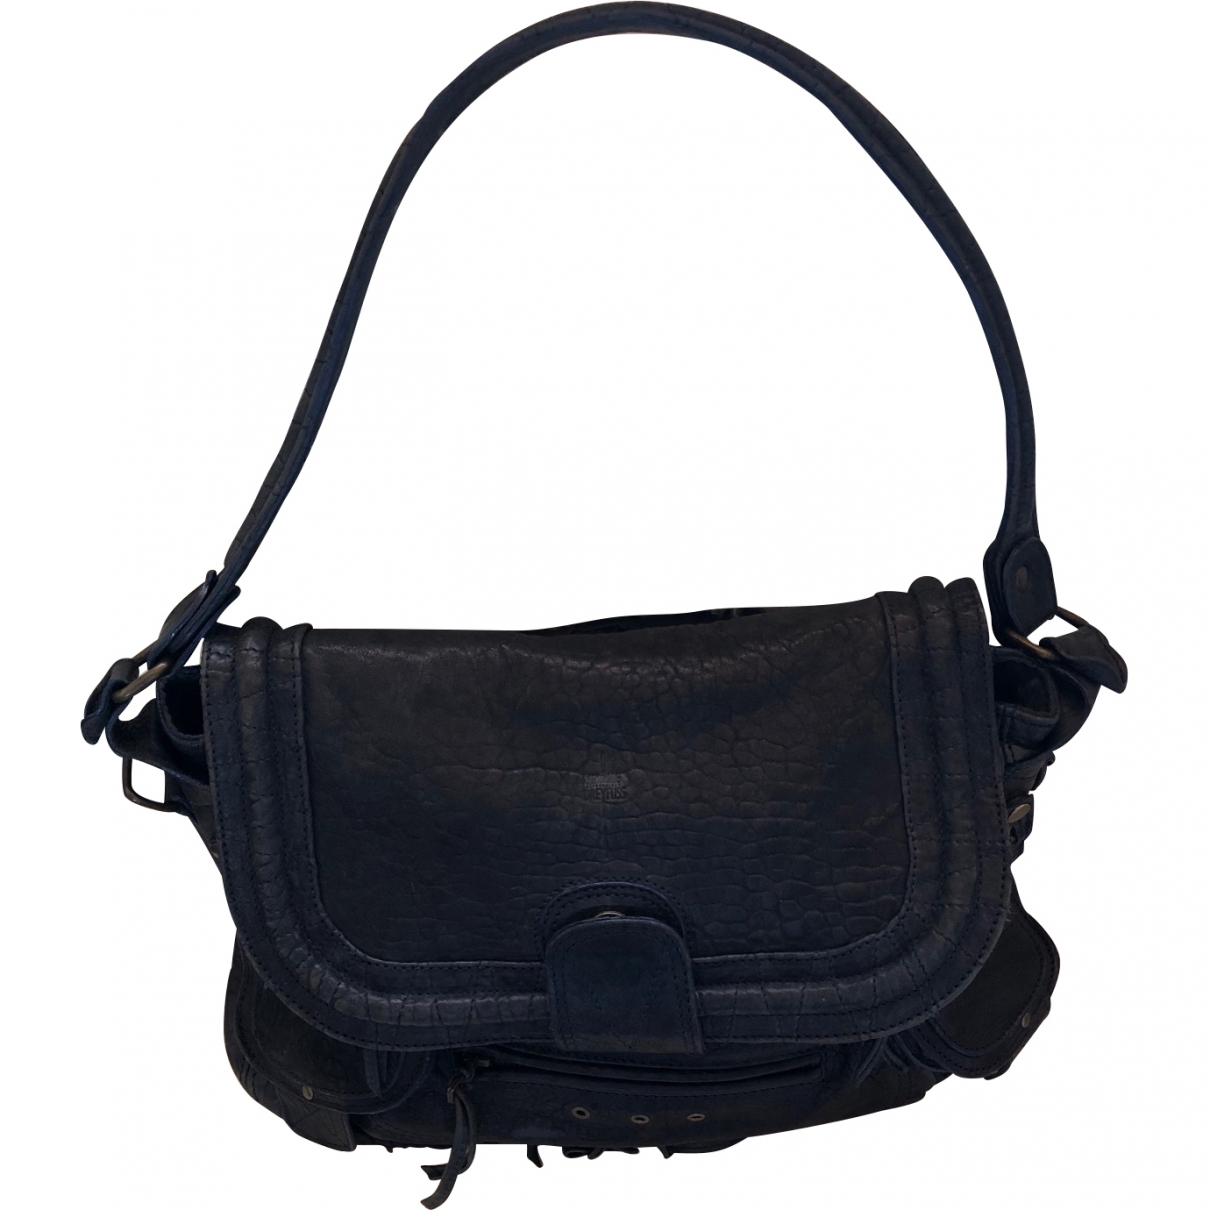 Jerome Dreyfuss \N Navy Leather handbag for Women \N